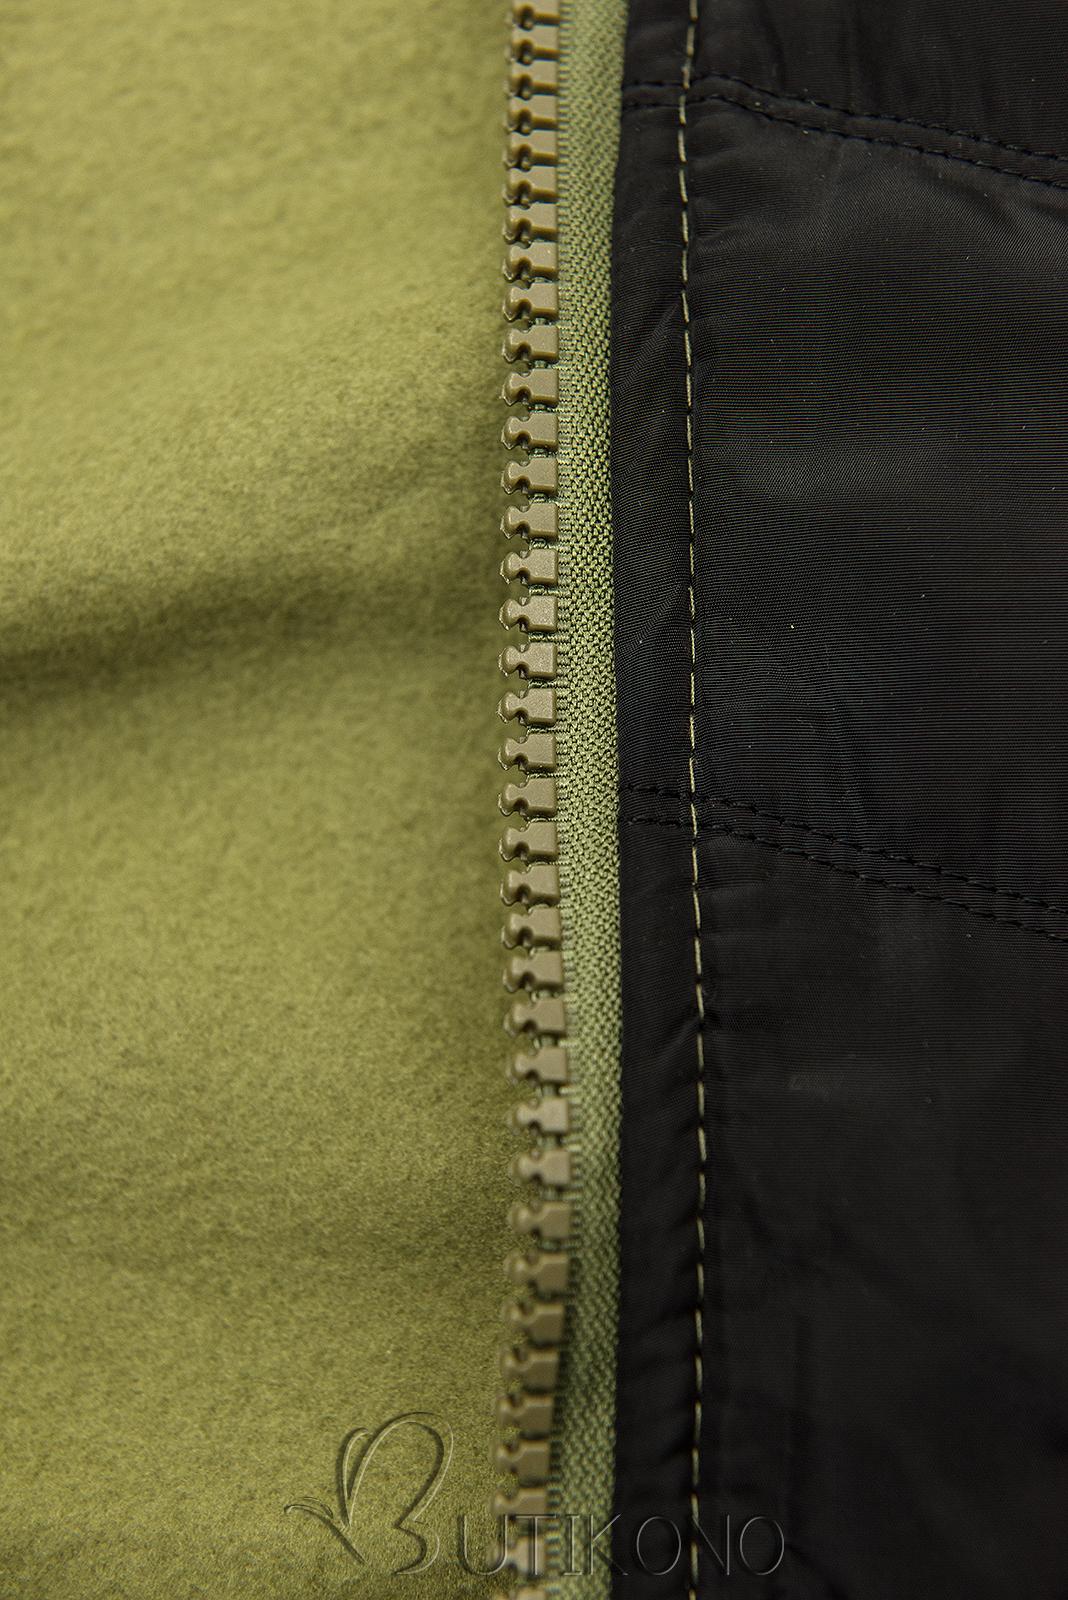 Khaki mikina s kombinovanými materiály